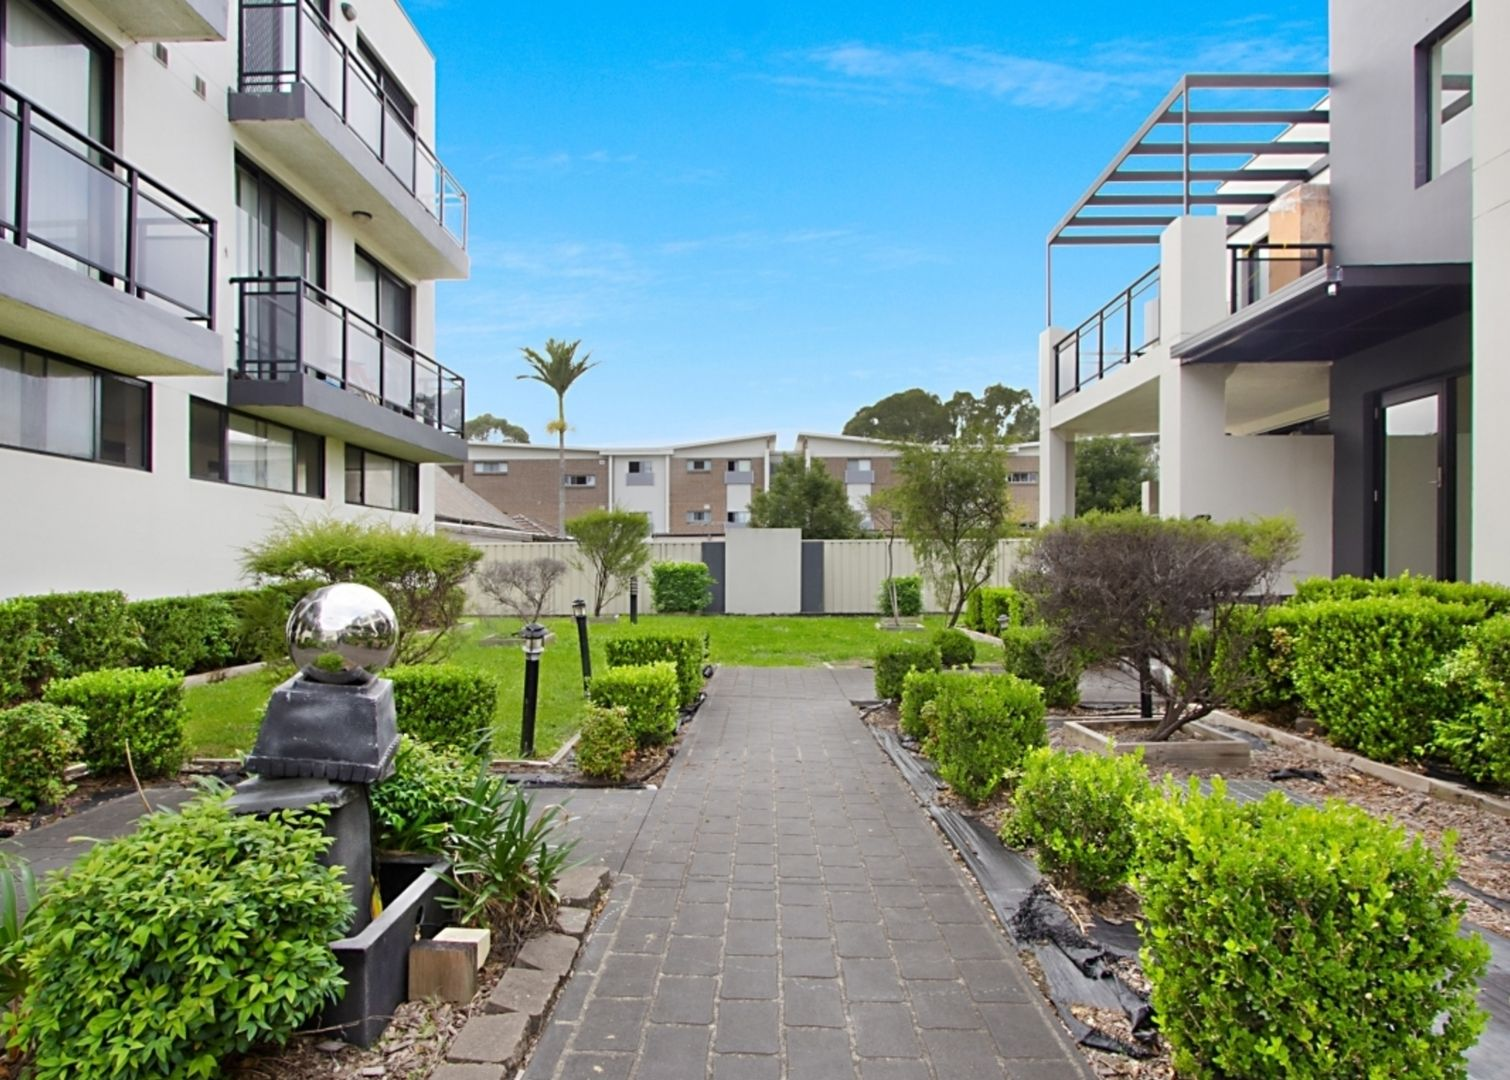 15/7 Short  Street, Wentworthville NSW 2145, Image 0